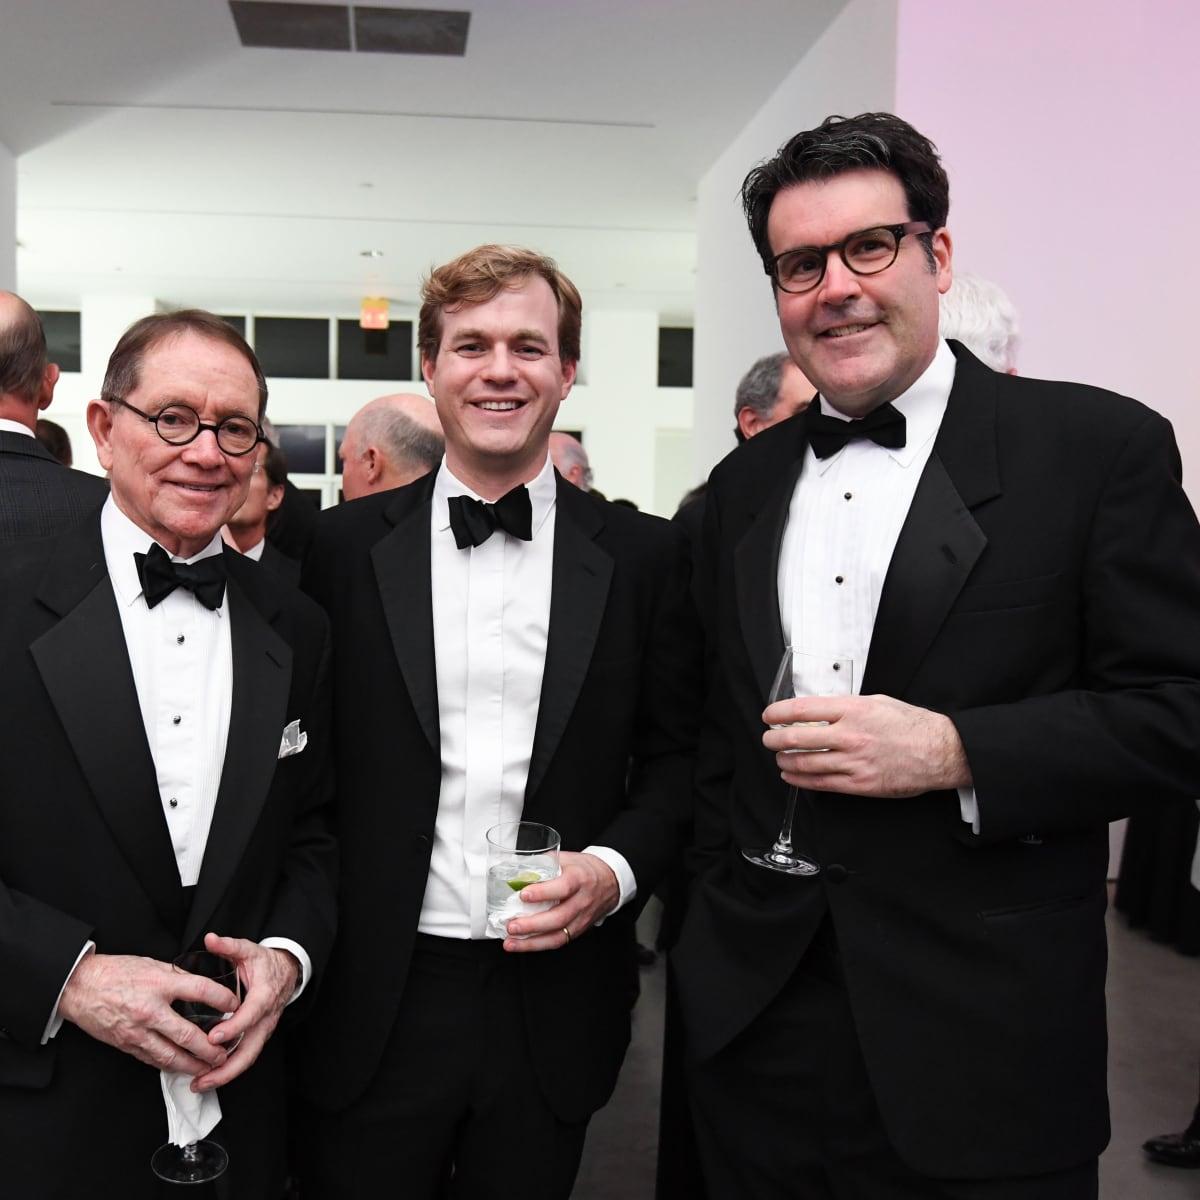 Bill Cannady, Tom Caughlin, and Menil Curator of Modern and Contemporary Art Toby Kamps at Men of Menil 2016